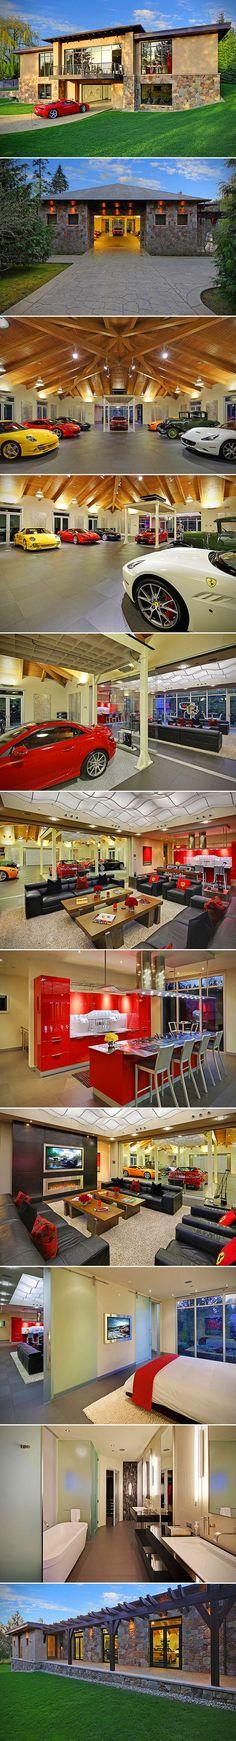 Garage layout on pinterest dream garage garage and for Garage sees automobile